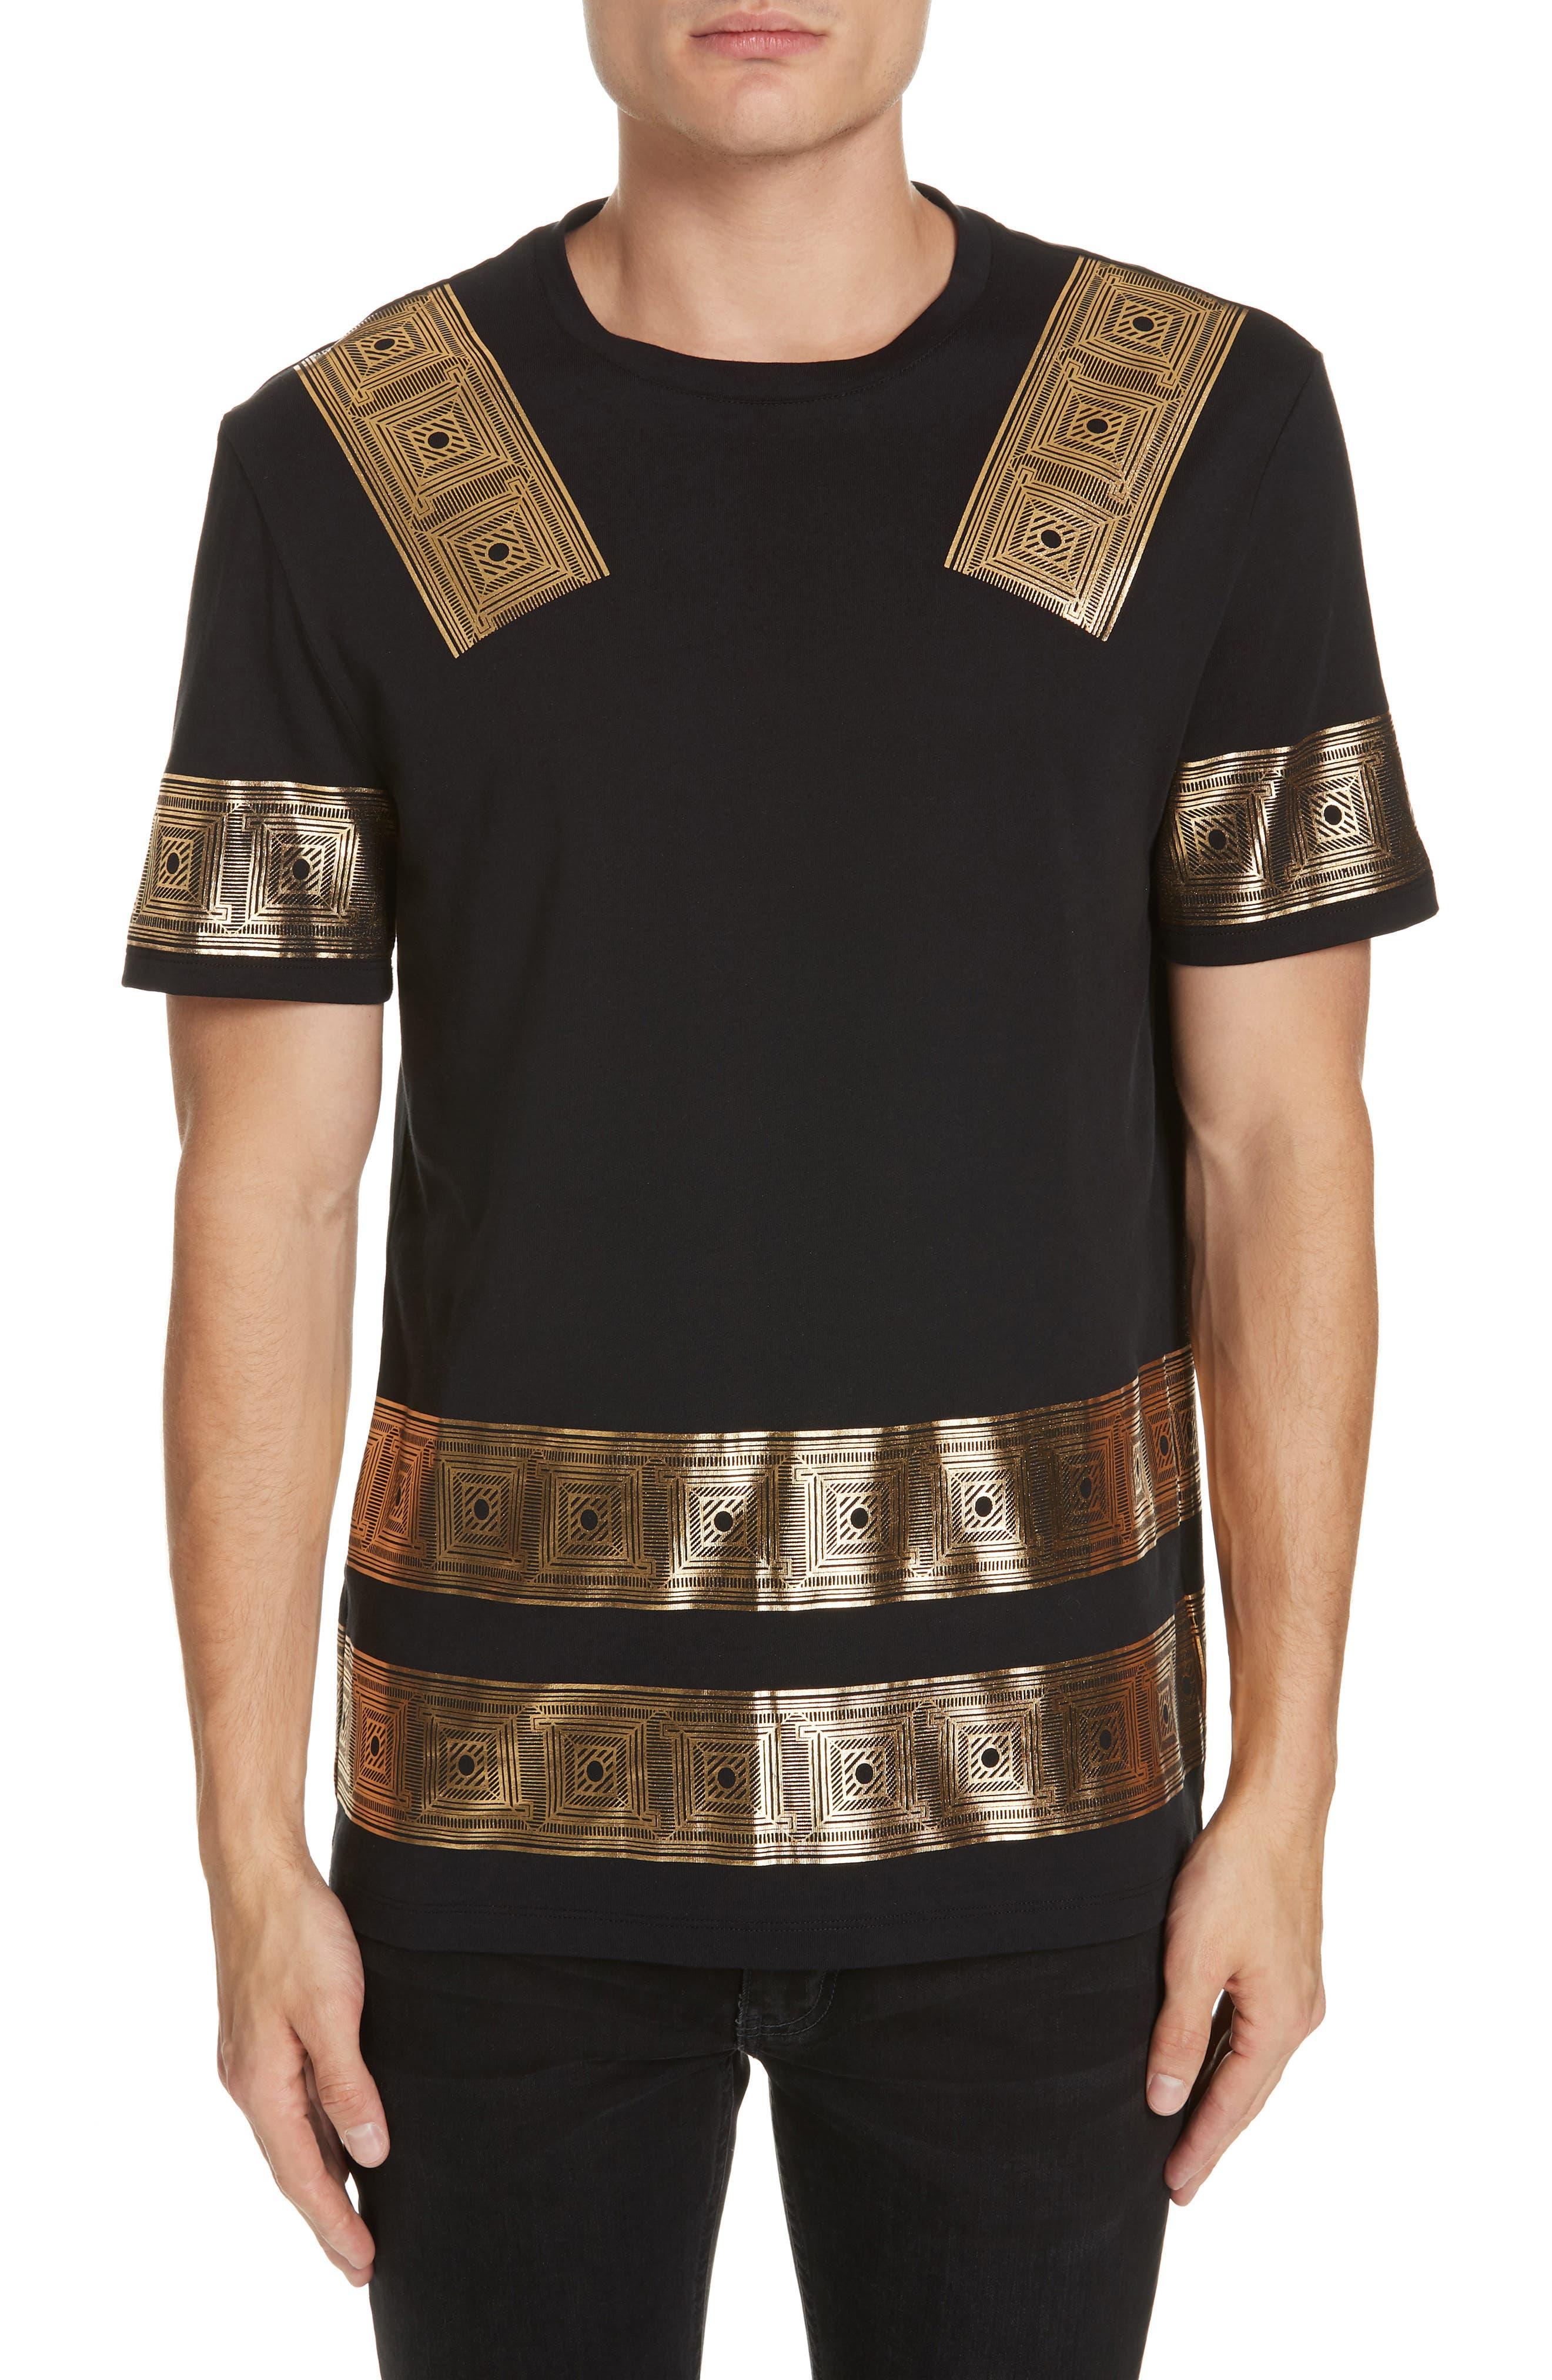 68897395 Versace Men's T-Shirts, stylish comfort clothing